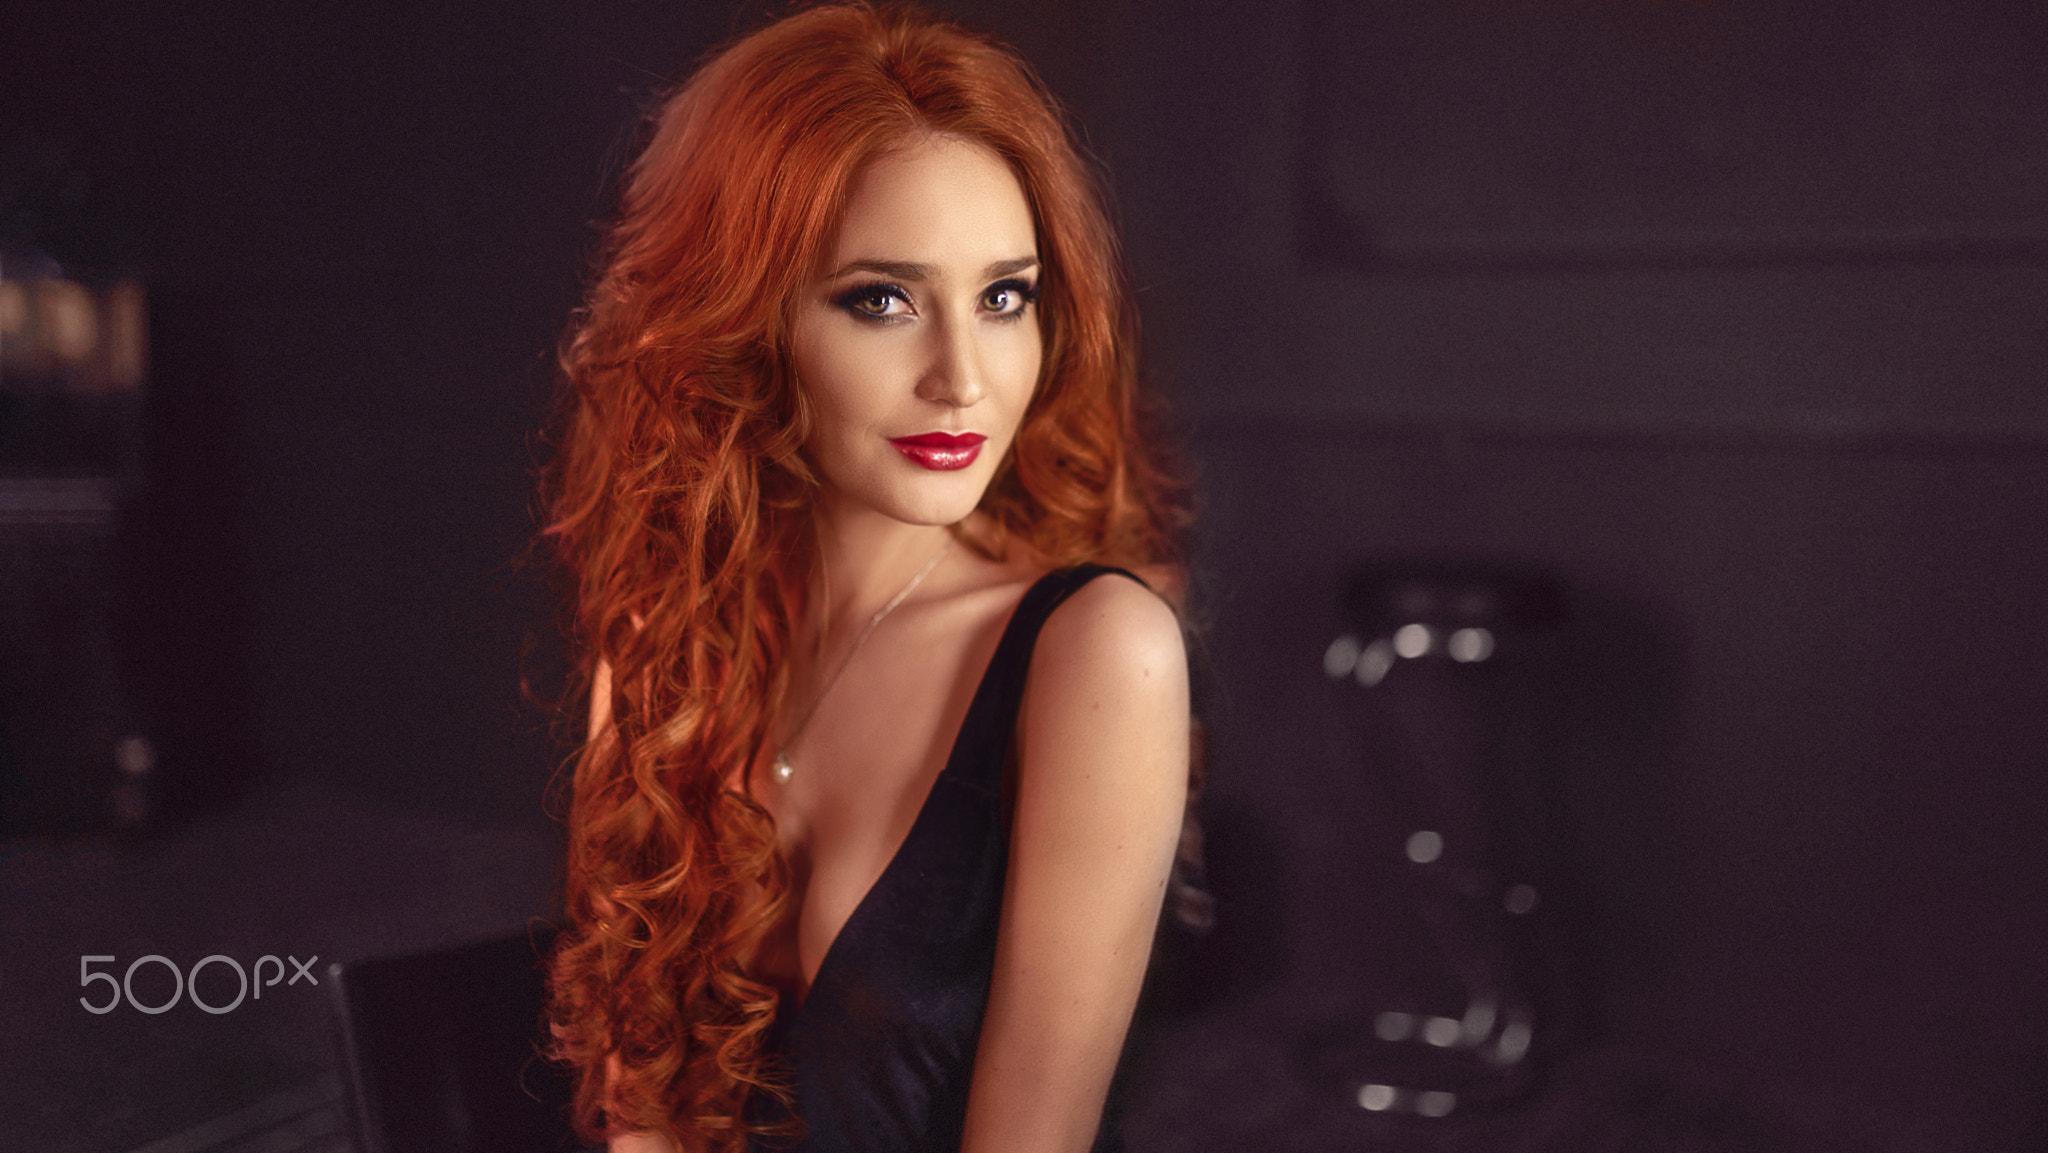 People 2048x1153 women redhead face dress bokeh long hair wavy hair eyeshadow red lipstick no bra portrait cleavage smirk hazel eyes black clothing